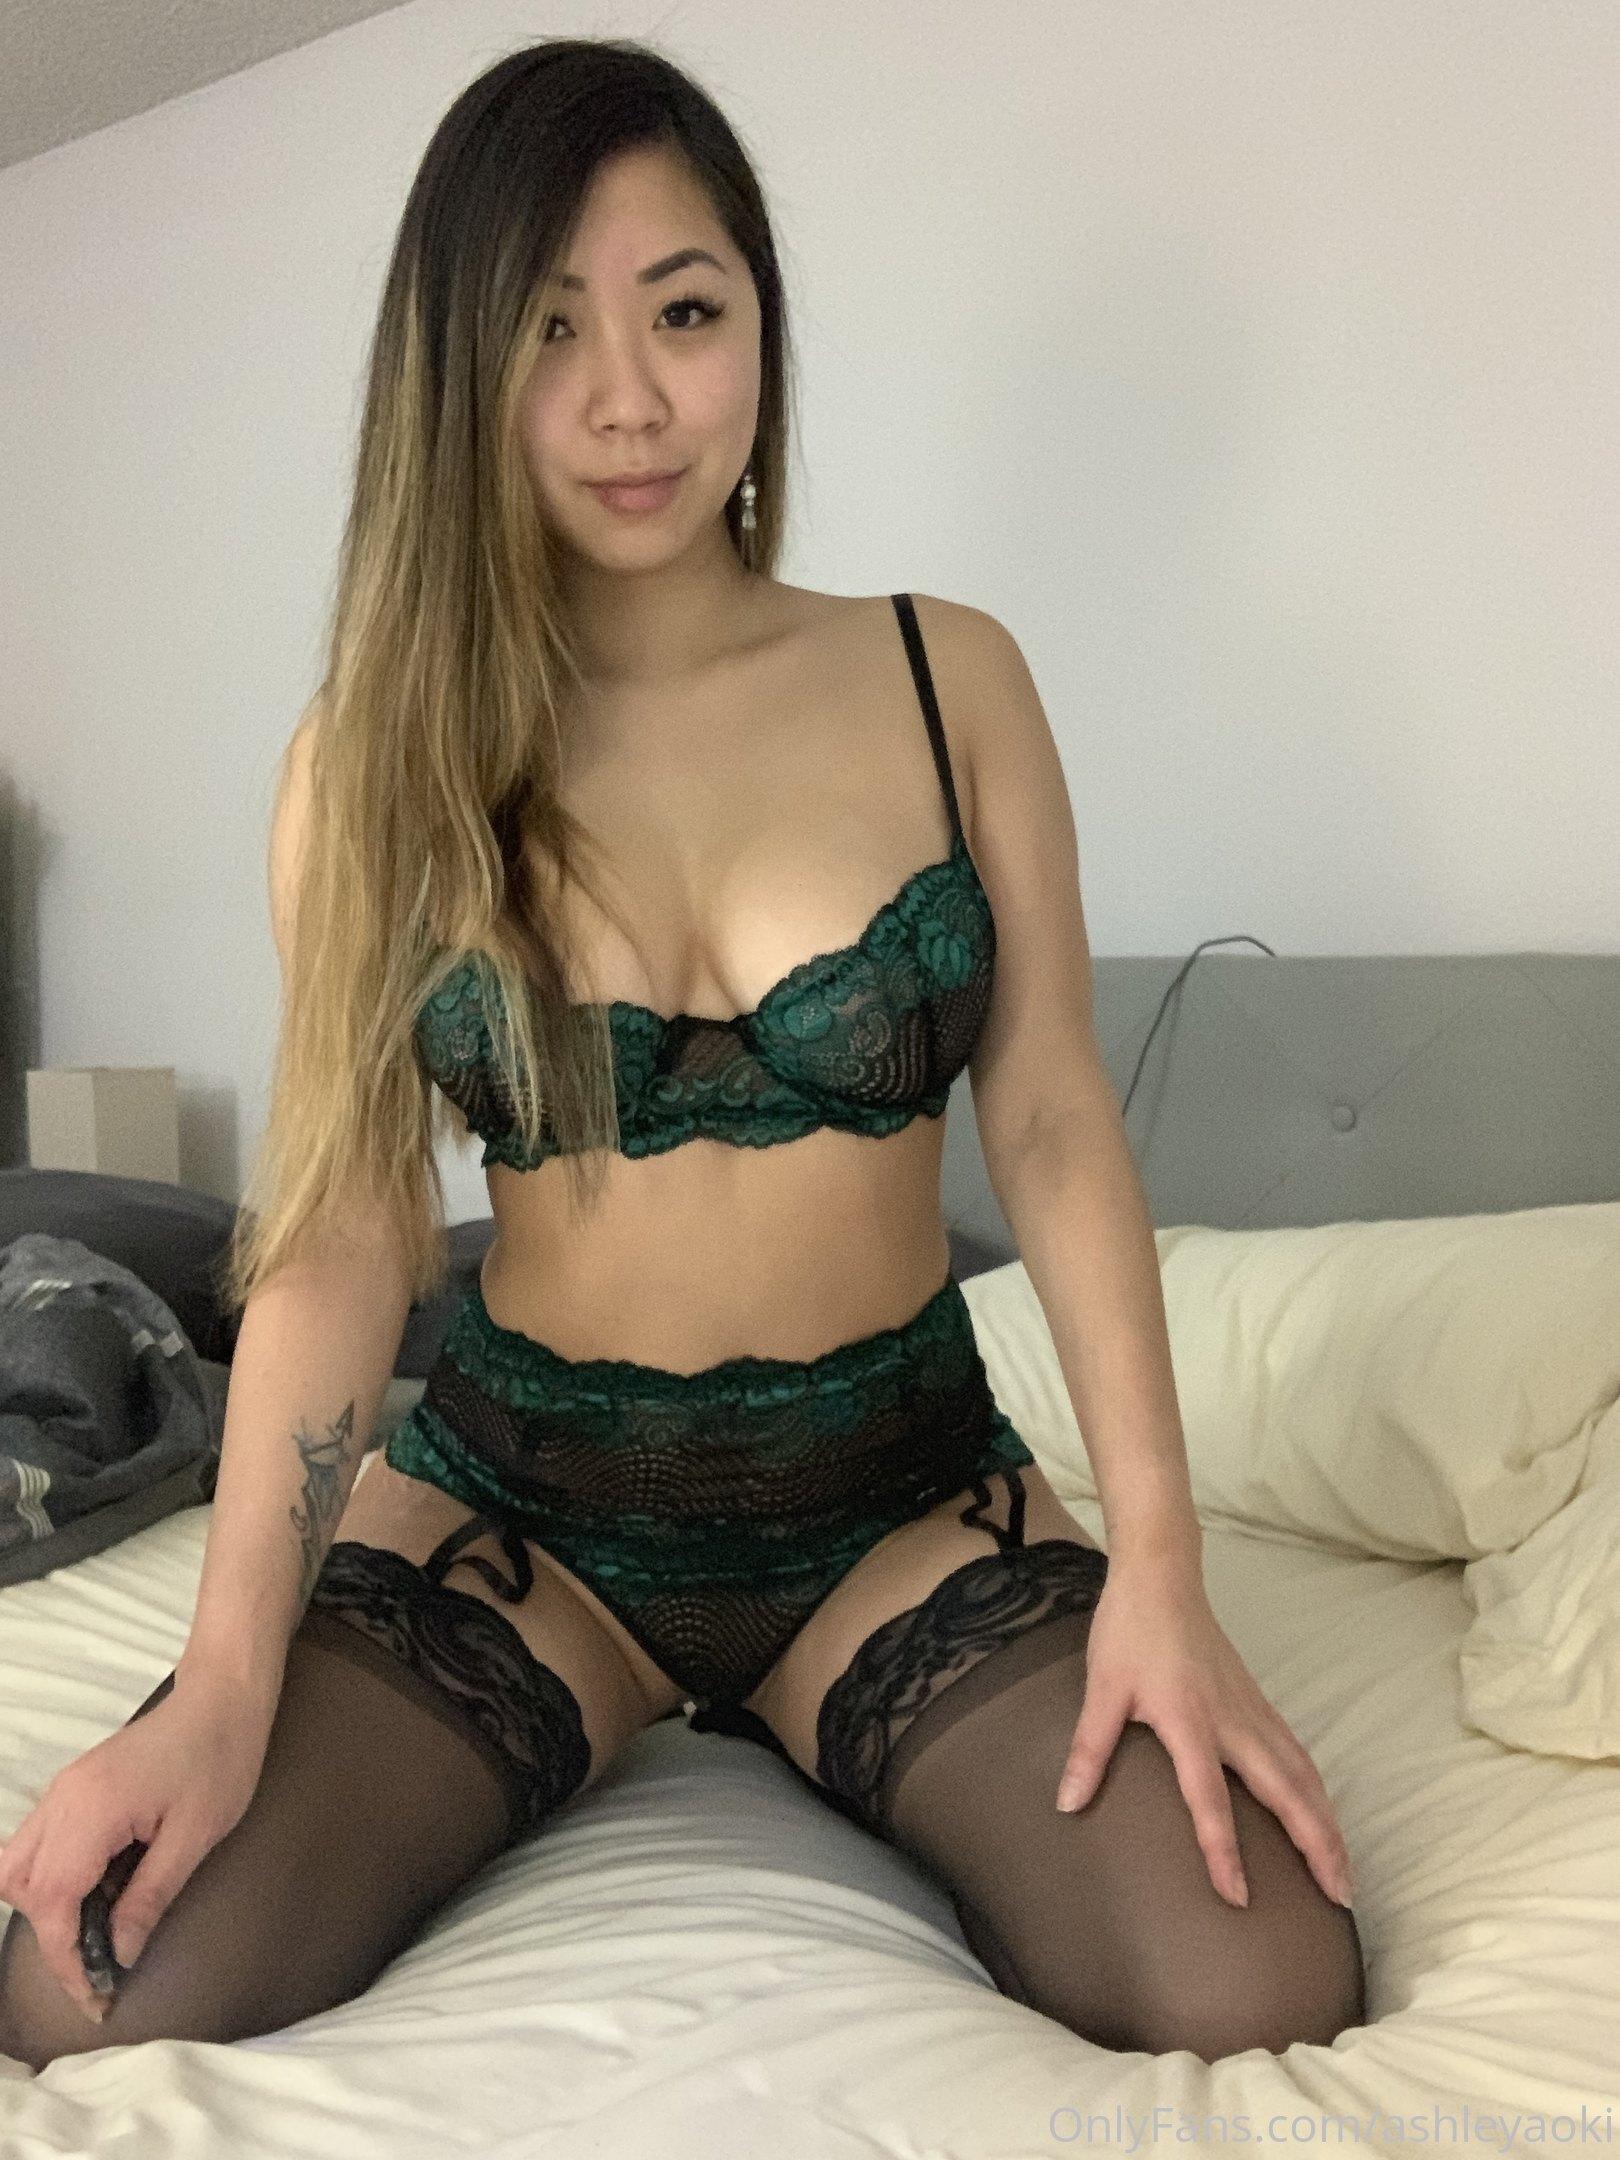 Ashley Aoki, Ashleyaoki, Onlyfans Leaks 0090